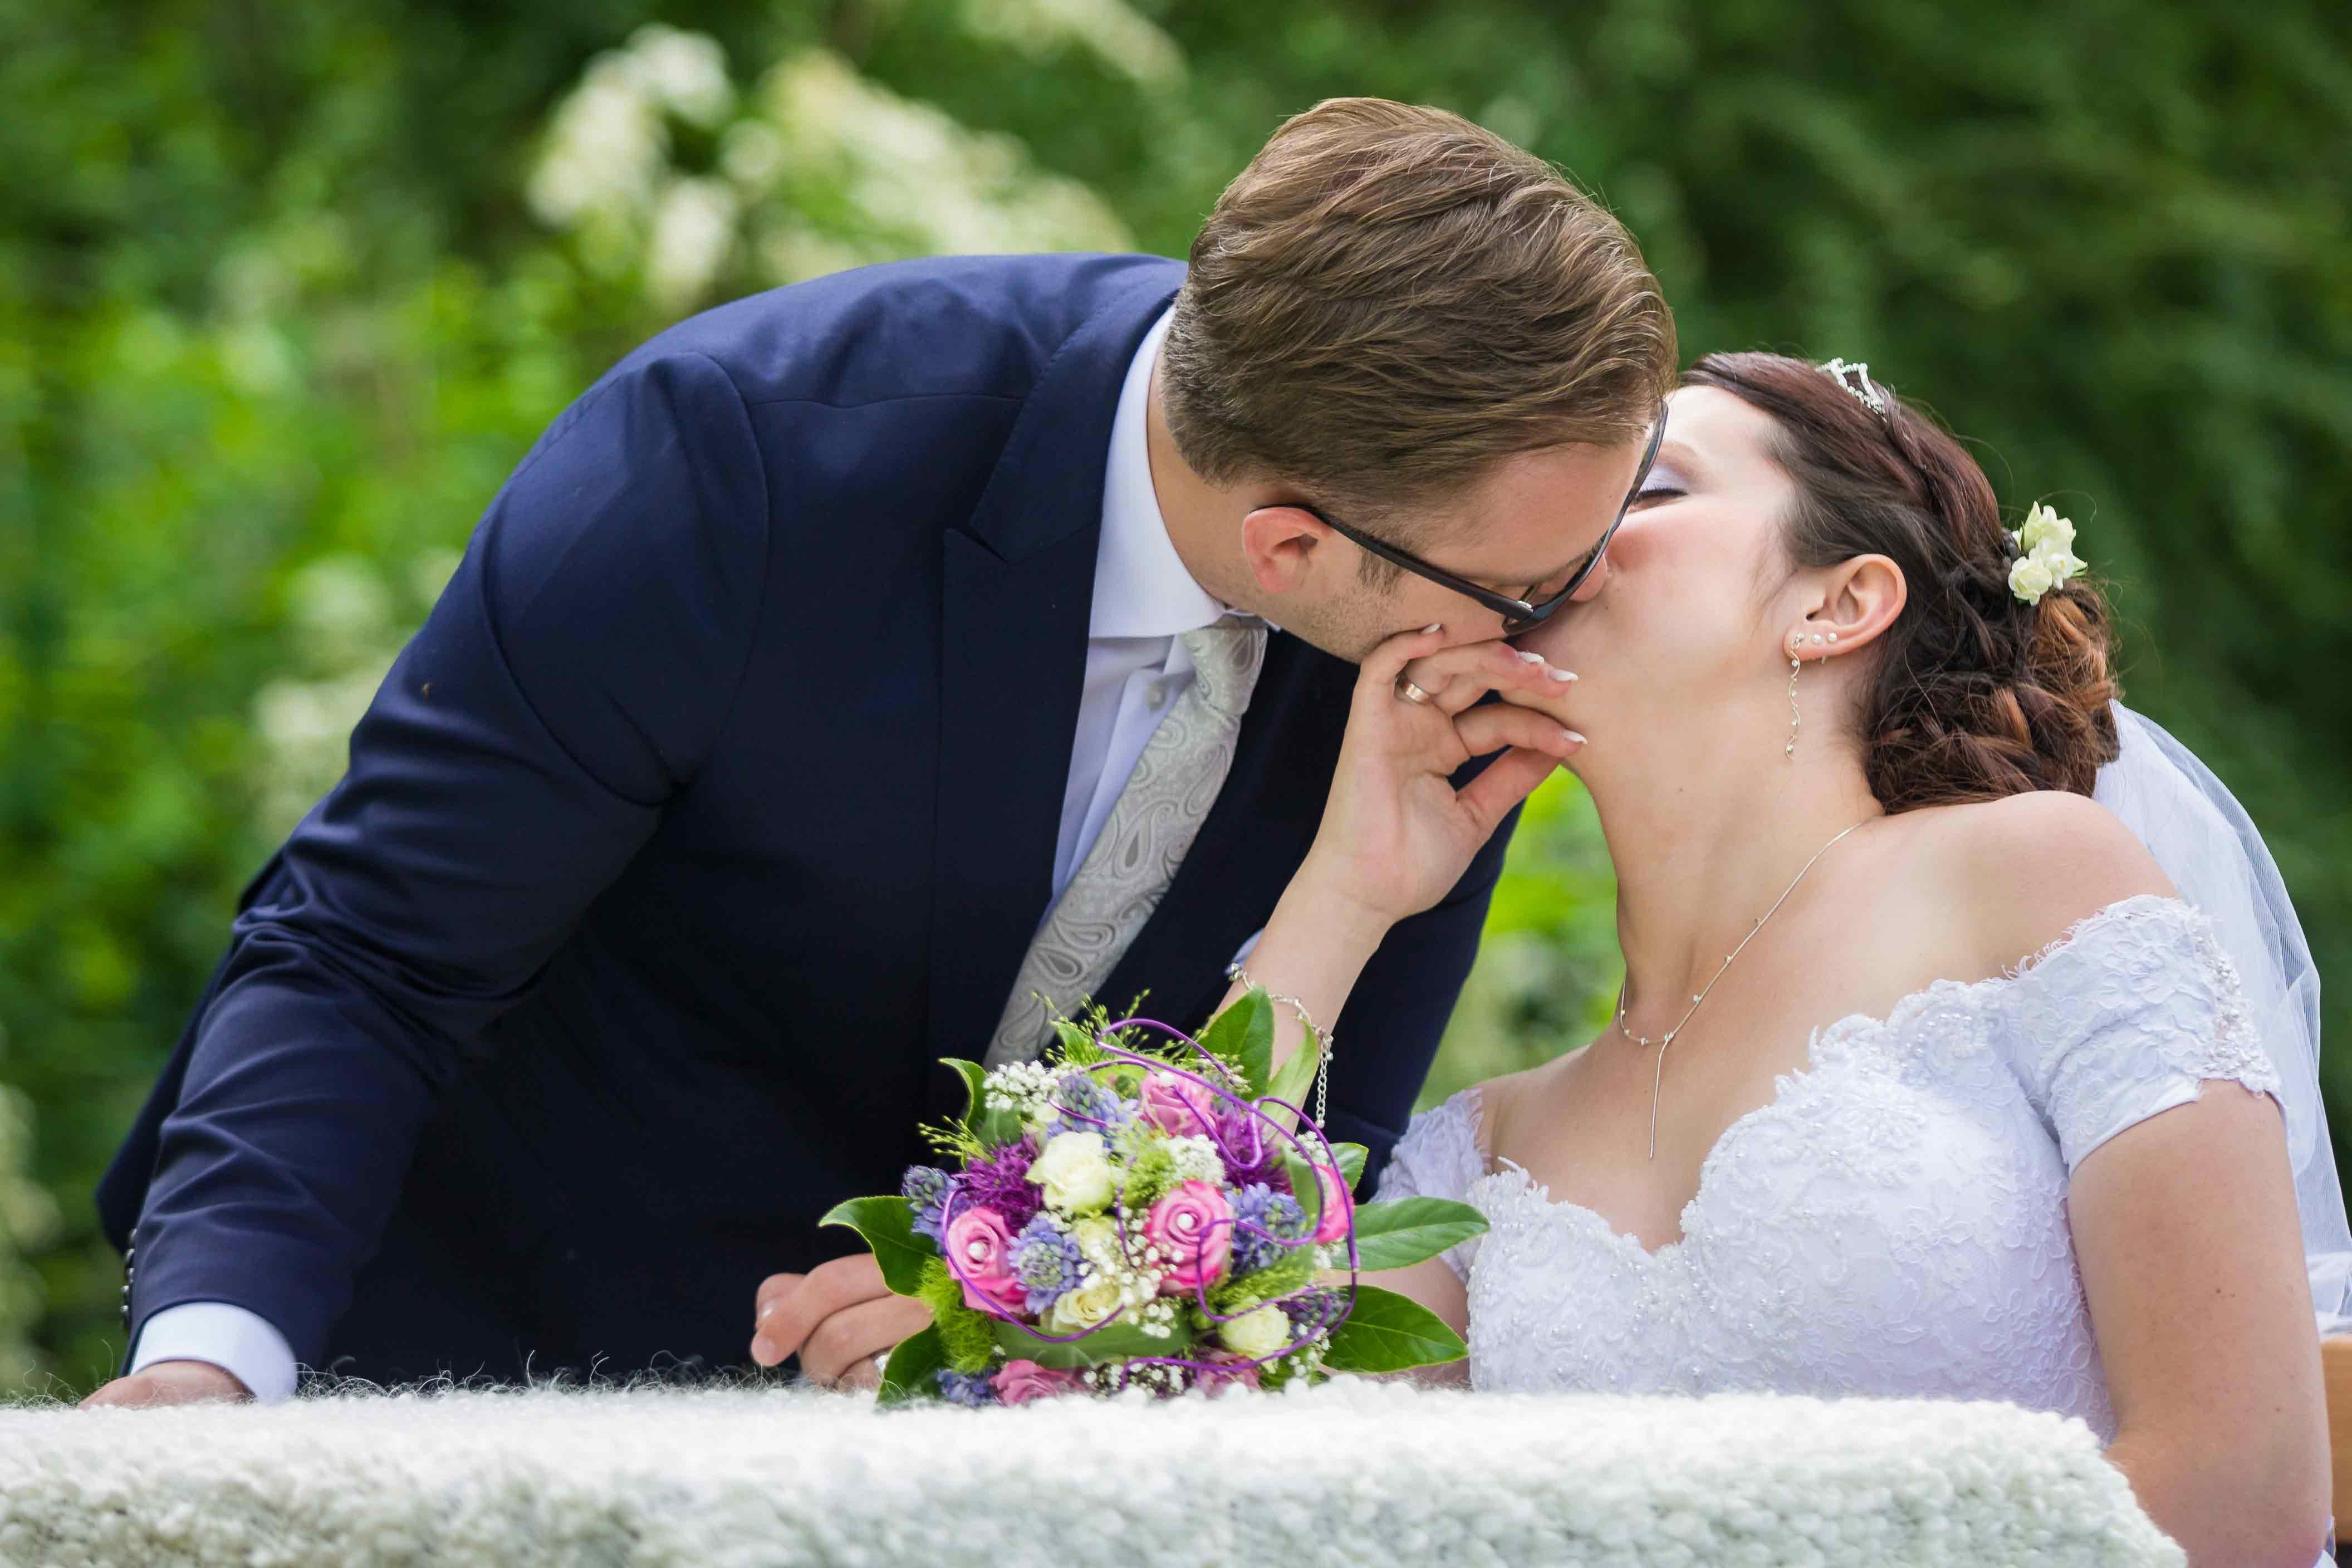 Hochzeitsfotografie-2267w